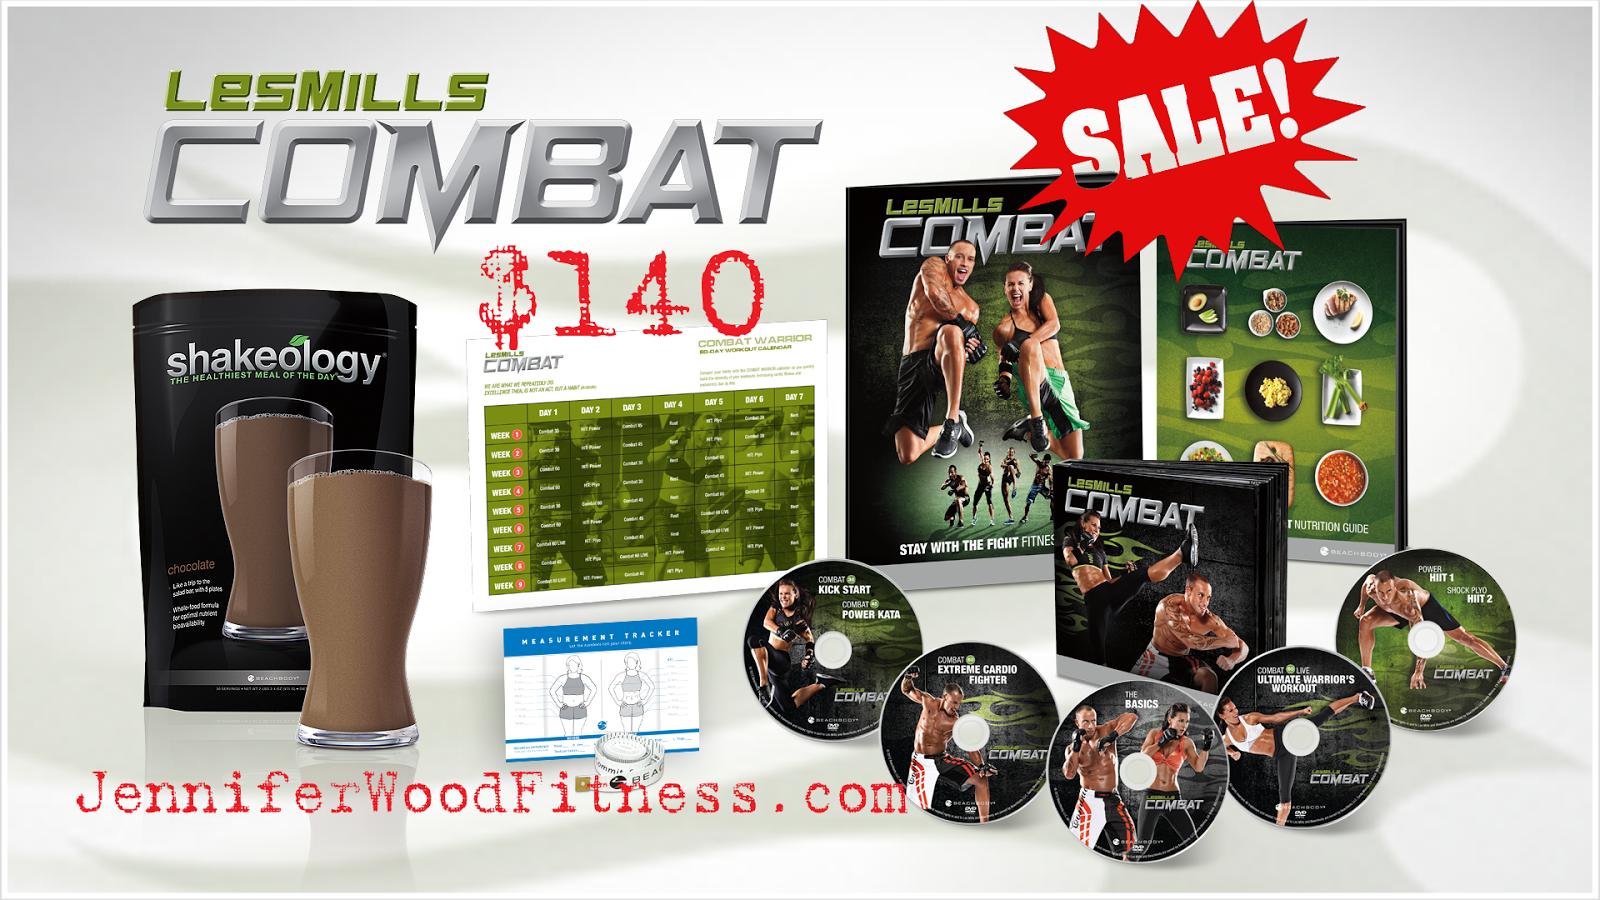 Jennifer Wood Fitness : Beachbody Les Mills Combat Discounted Inside Les Mills Combat Ultimate Warrior Schedule